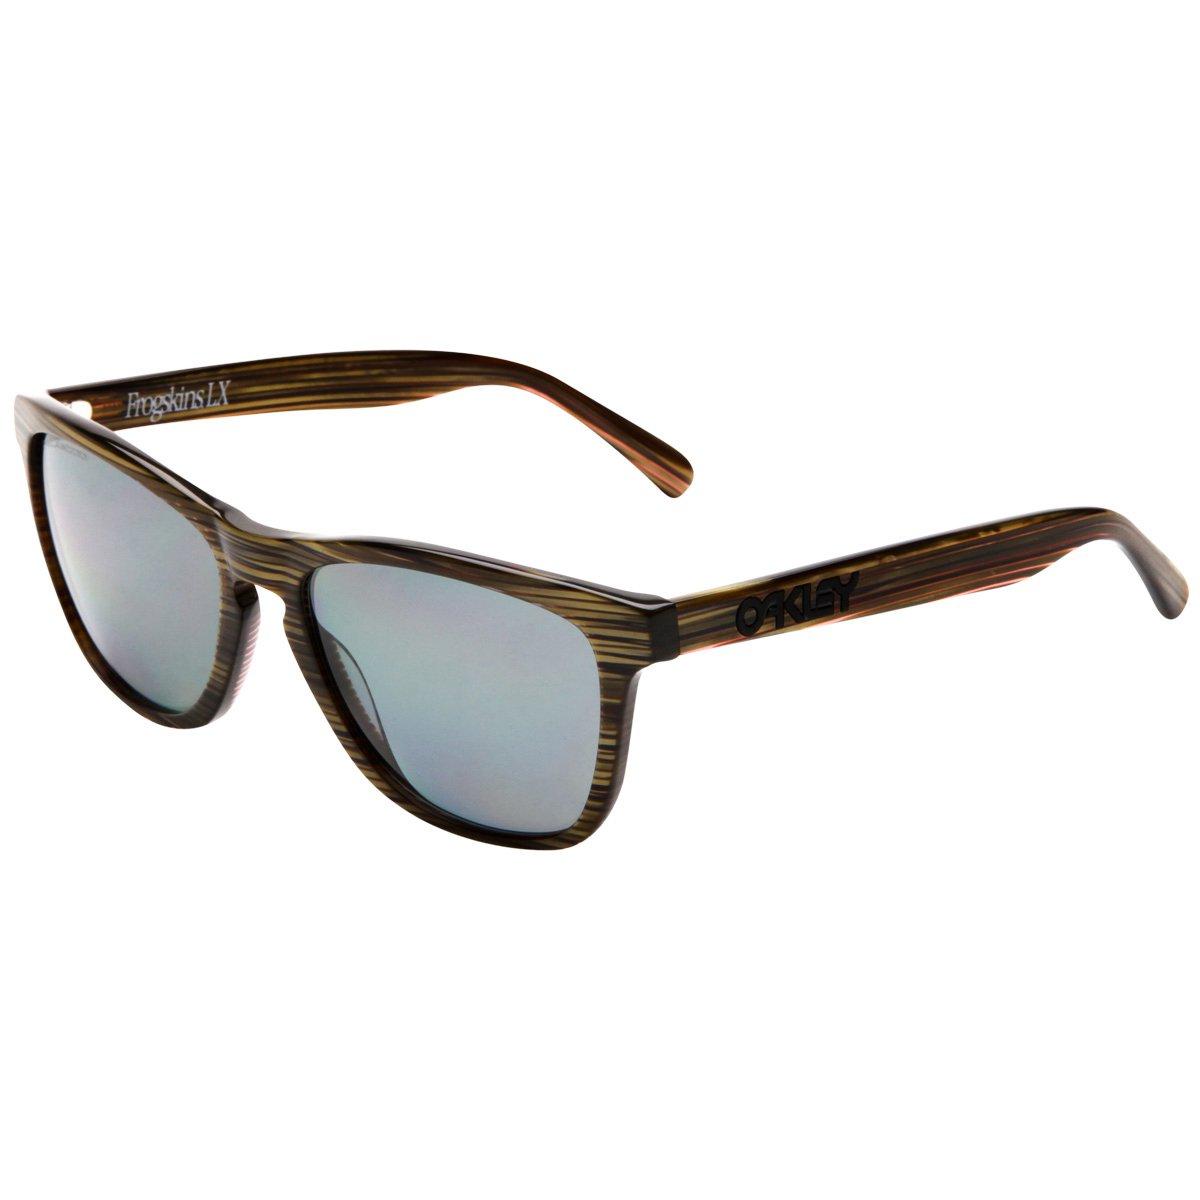 aead0fb520d7f Óculos de Sol Oakley Frogskins LX - Compre Agora